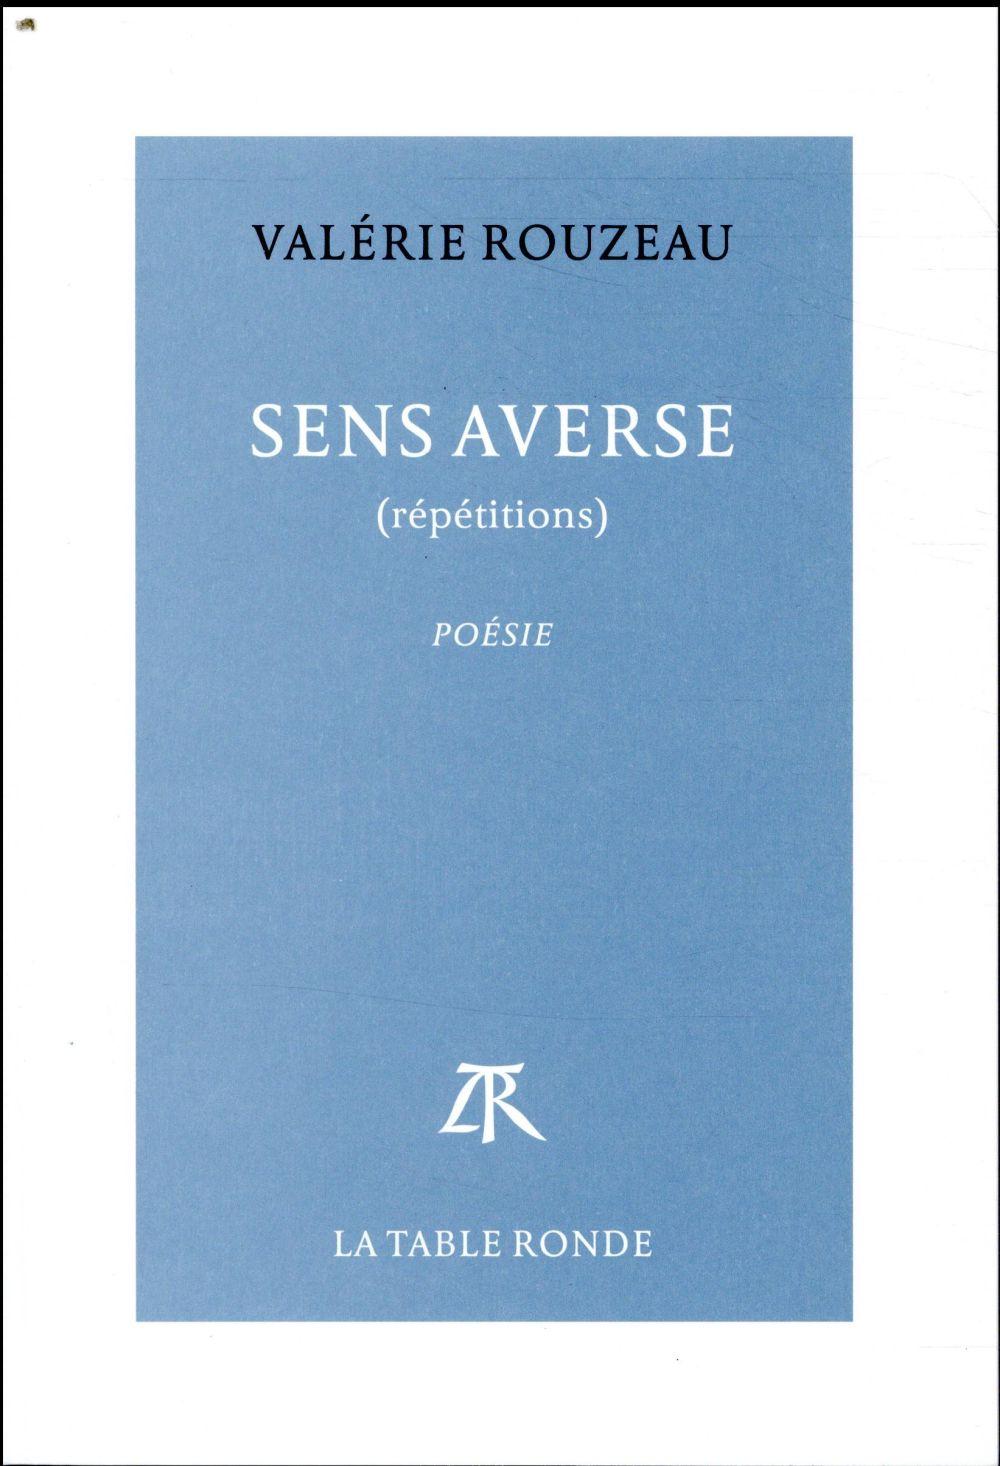 SENS AVERSE - (REPETITIONS)